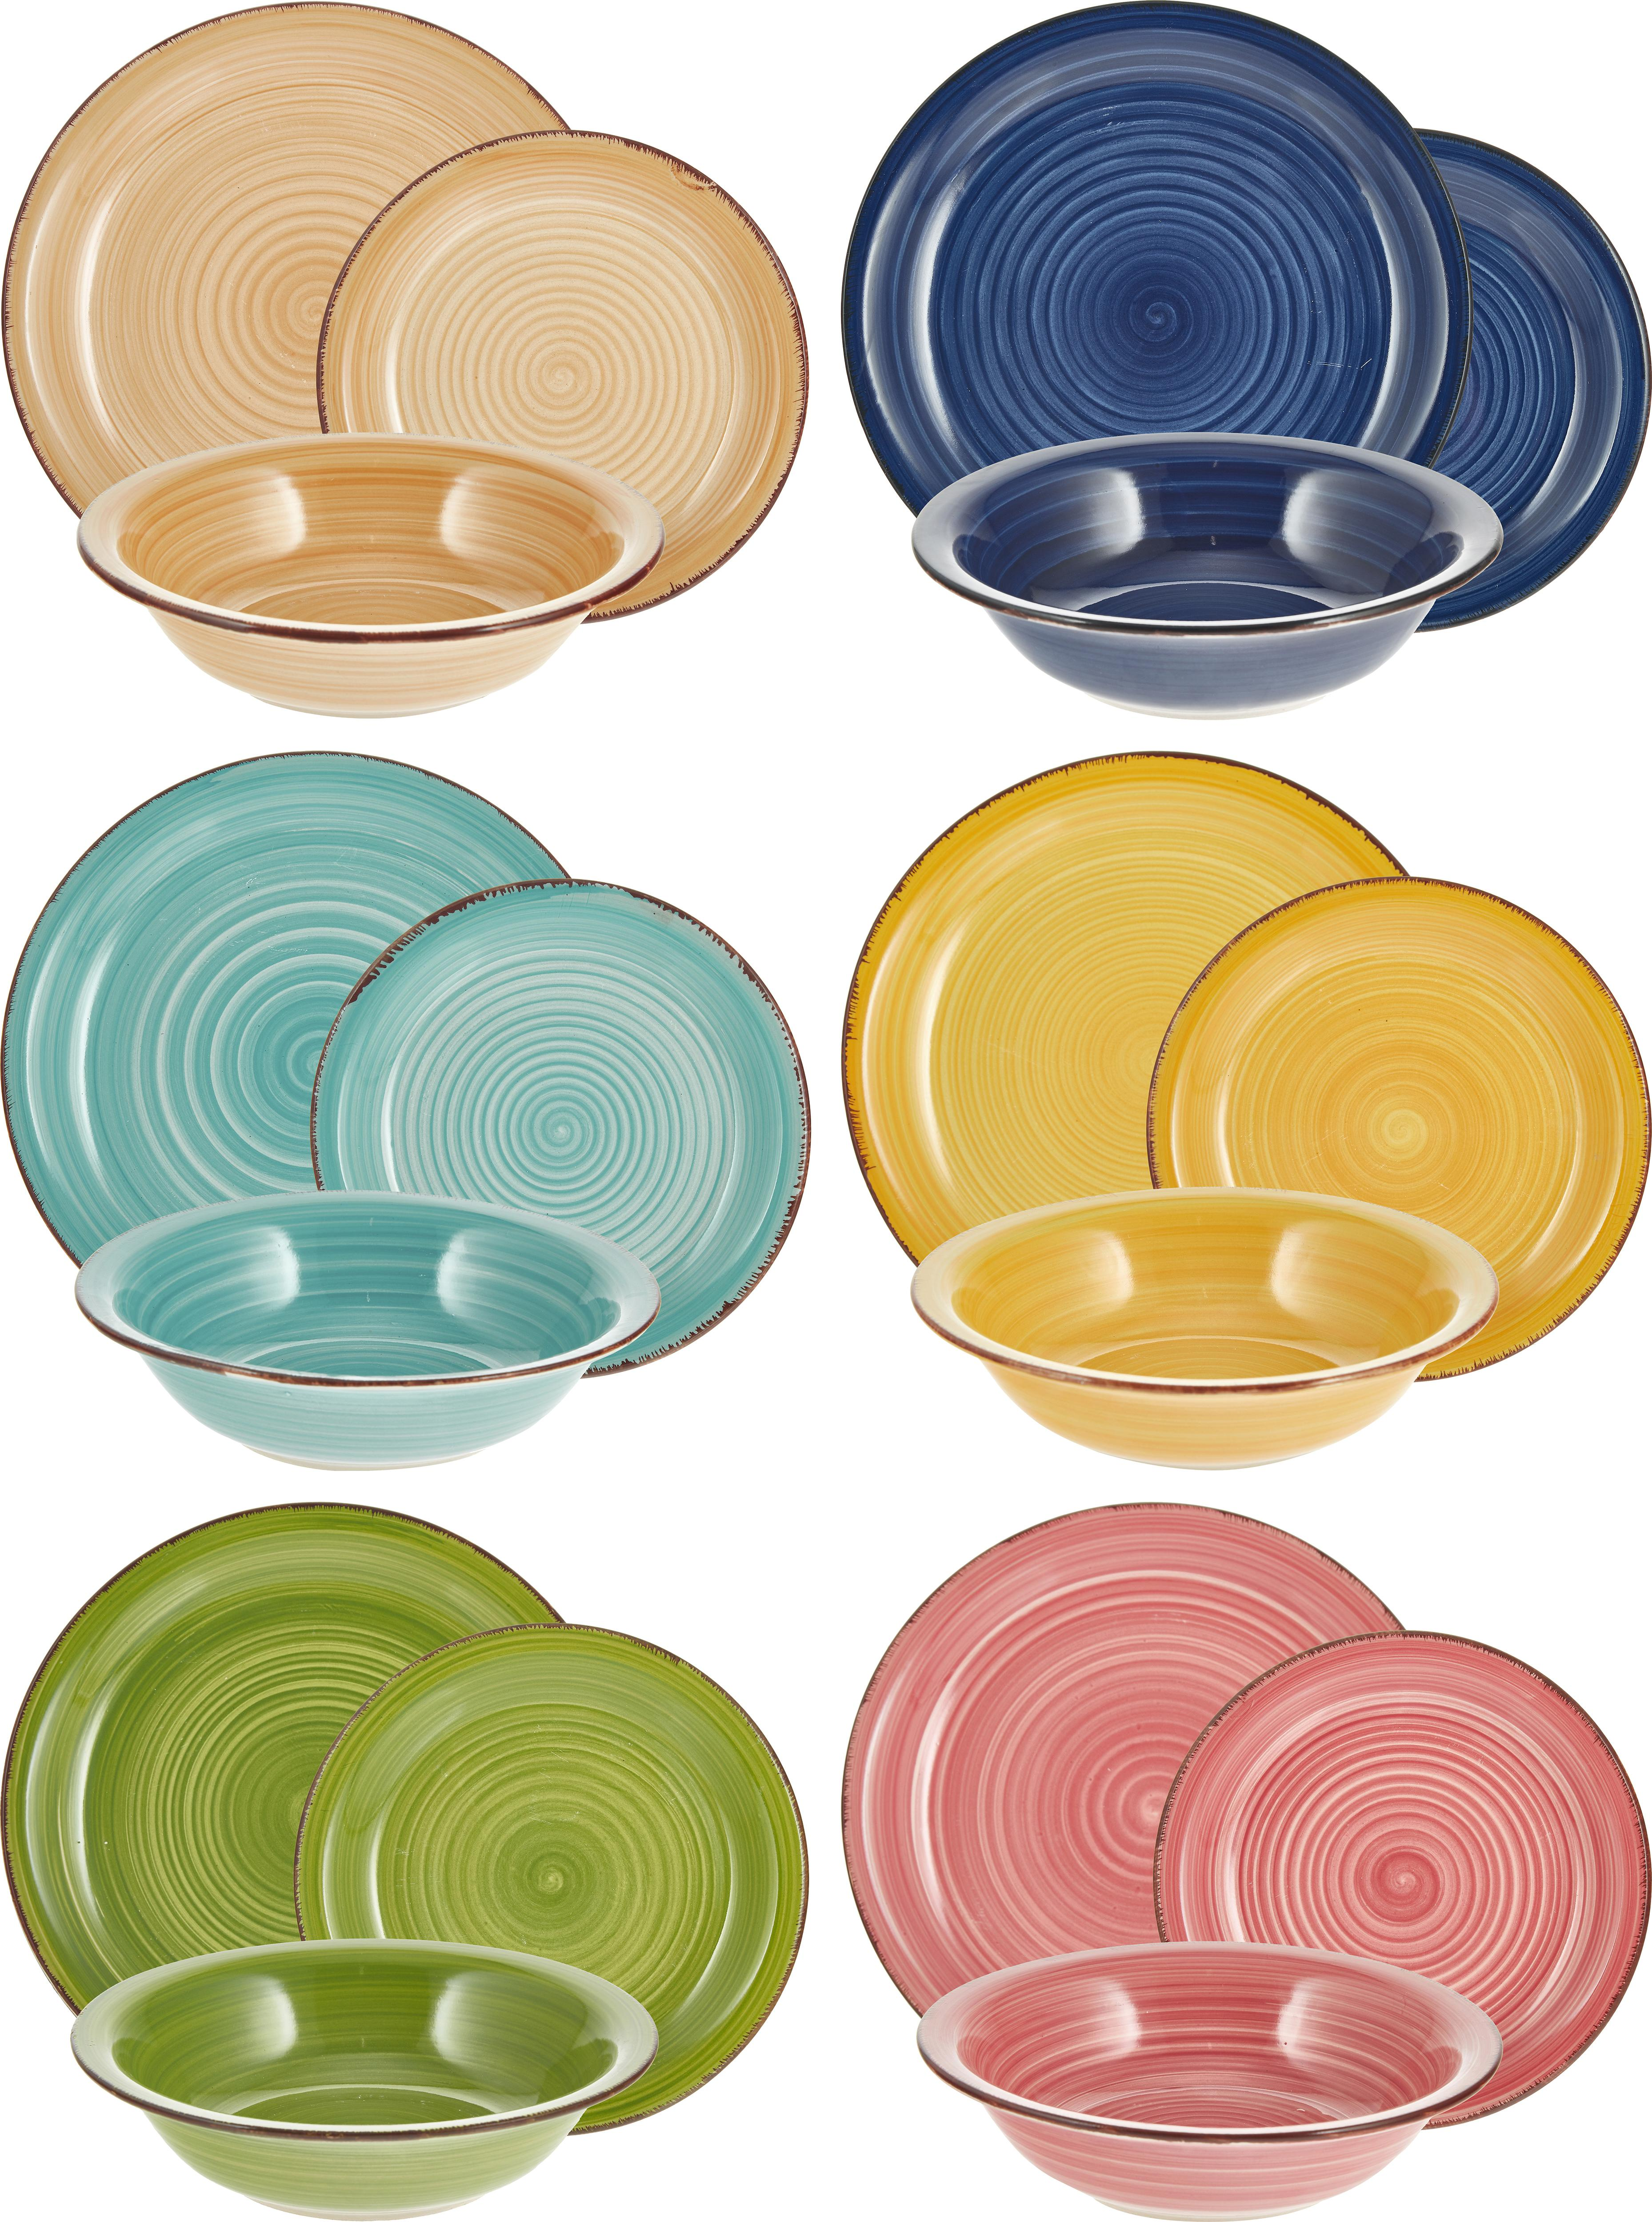 Vajilla artesanal Baita, 6comensales (18pzas.), Gres (dolomita) pintadoamano, Azul oscuro, rojo, verde, turquesa, amarillo, naranja claro, Tamaños diferentes